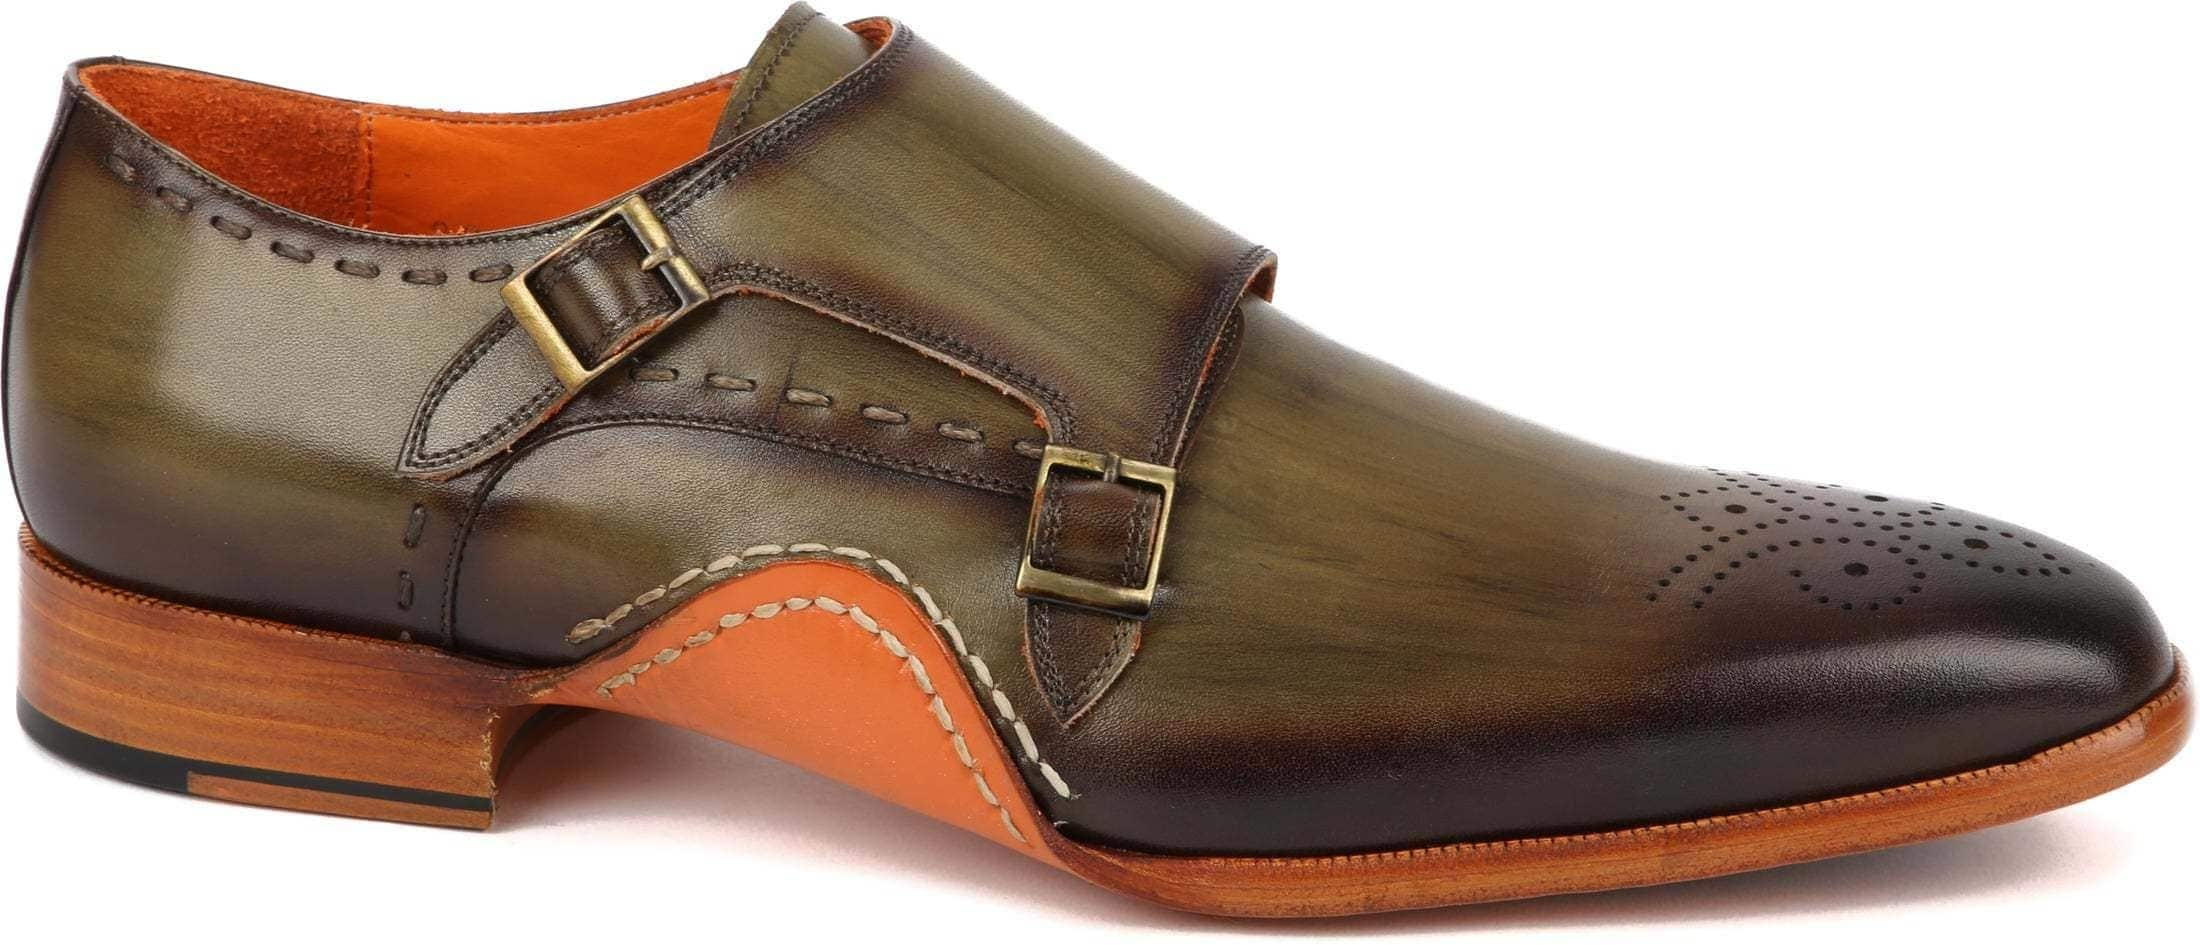 Melik Double Monk Strap Shoe Drago Green foto 0